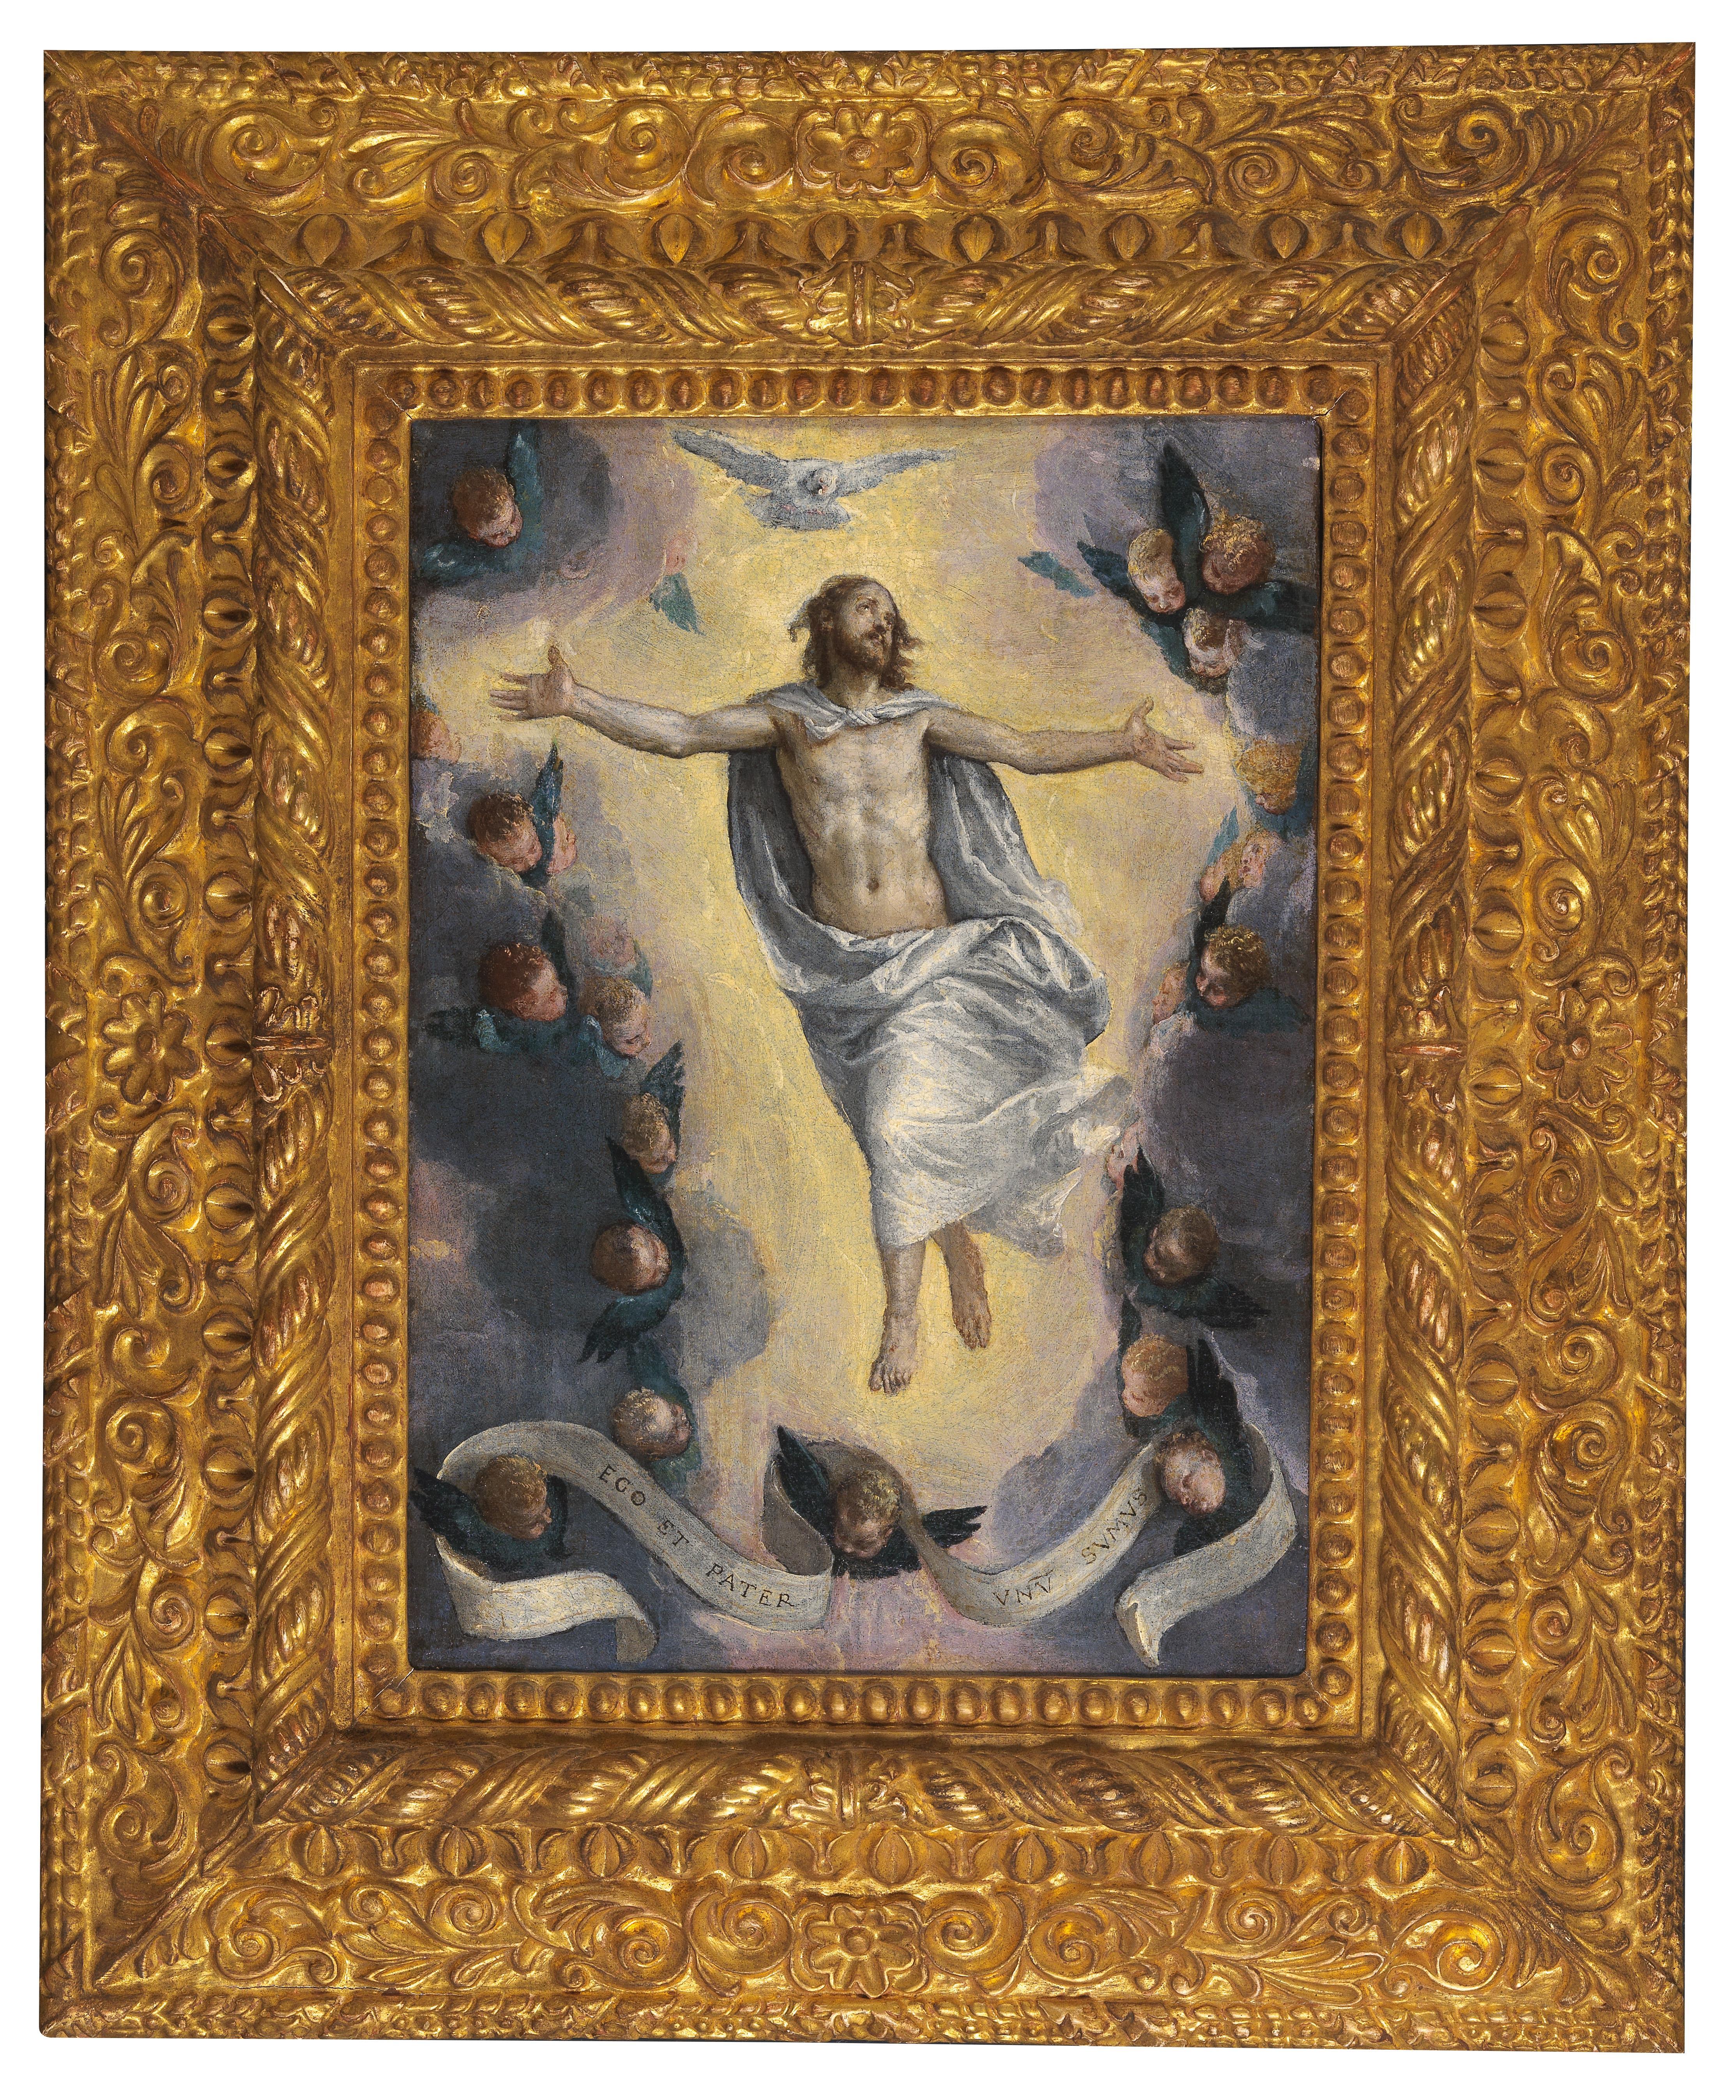 Paolo Caliari gen. il Veronese (1528–1588) Christus in Gloria Öl auf Leinwand, 42 x 30 cm, erzielter Preis € 149.922